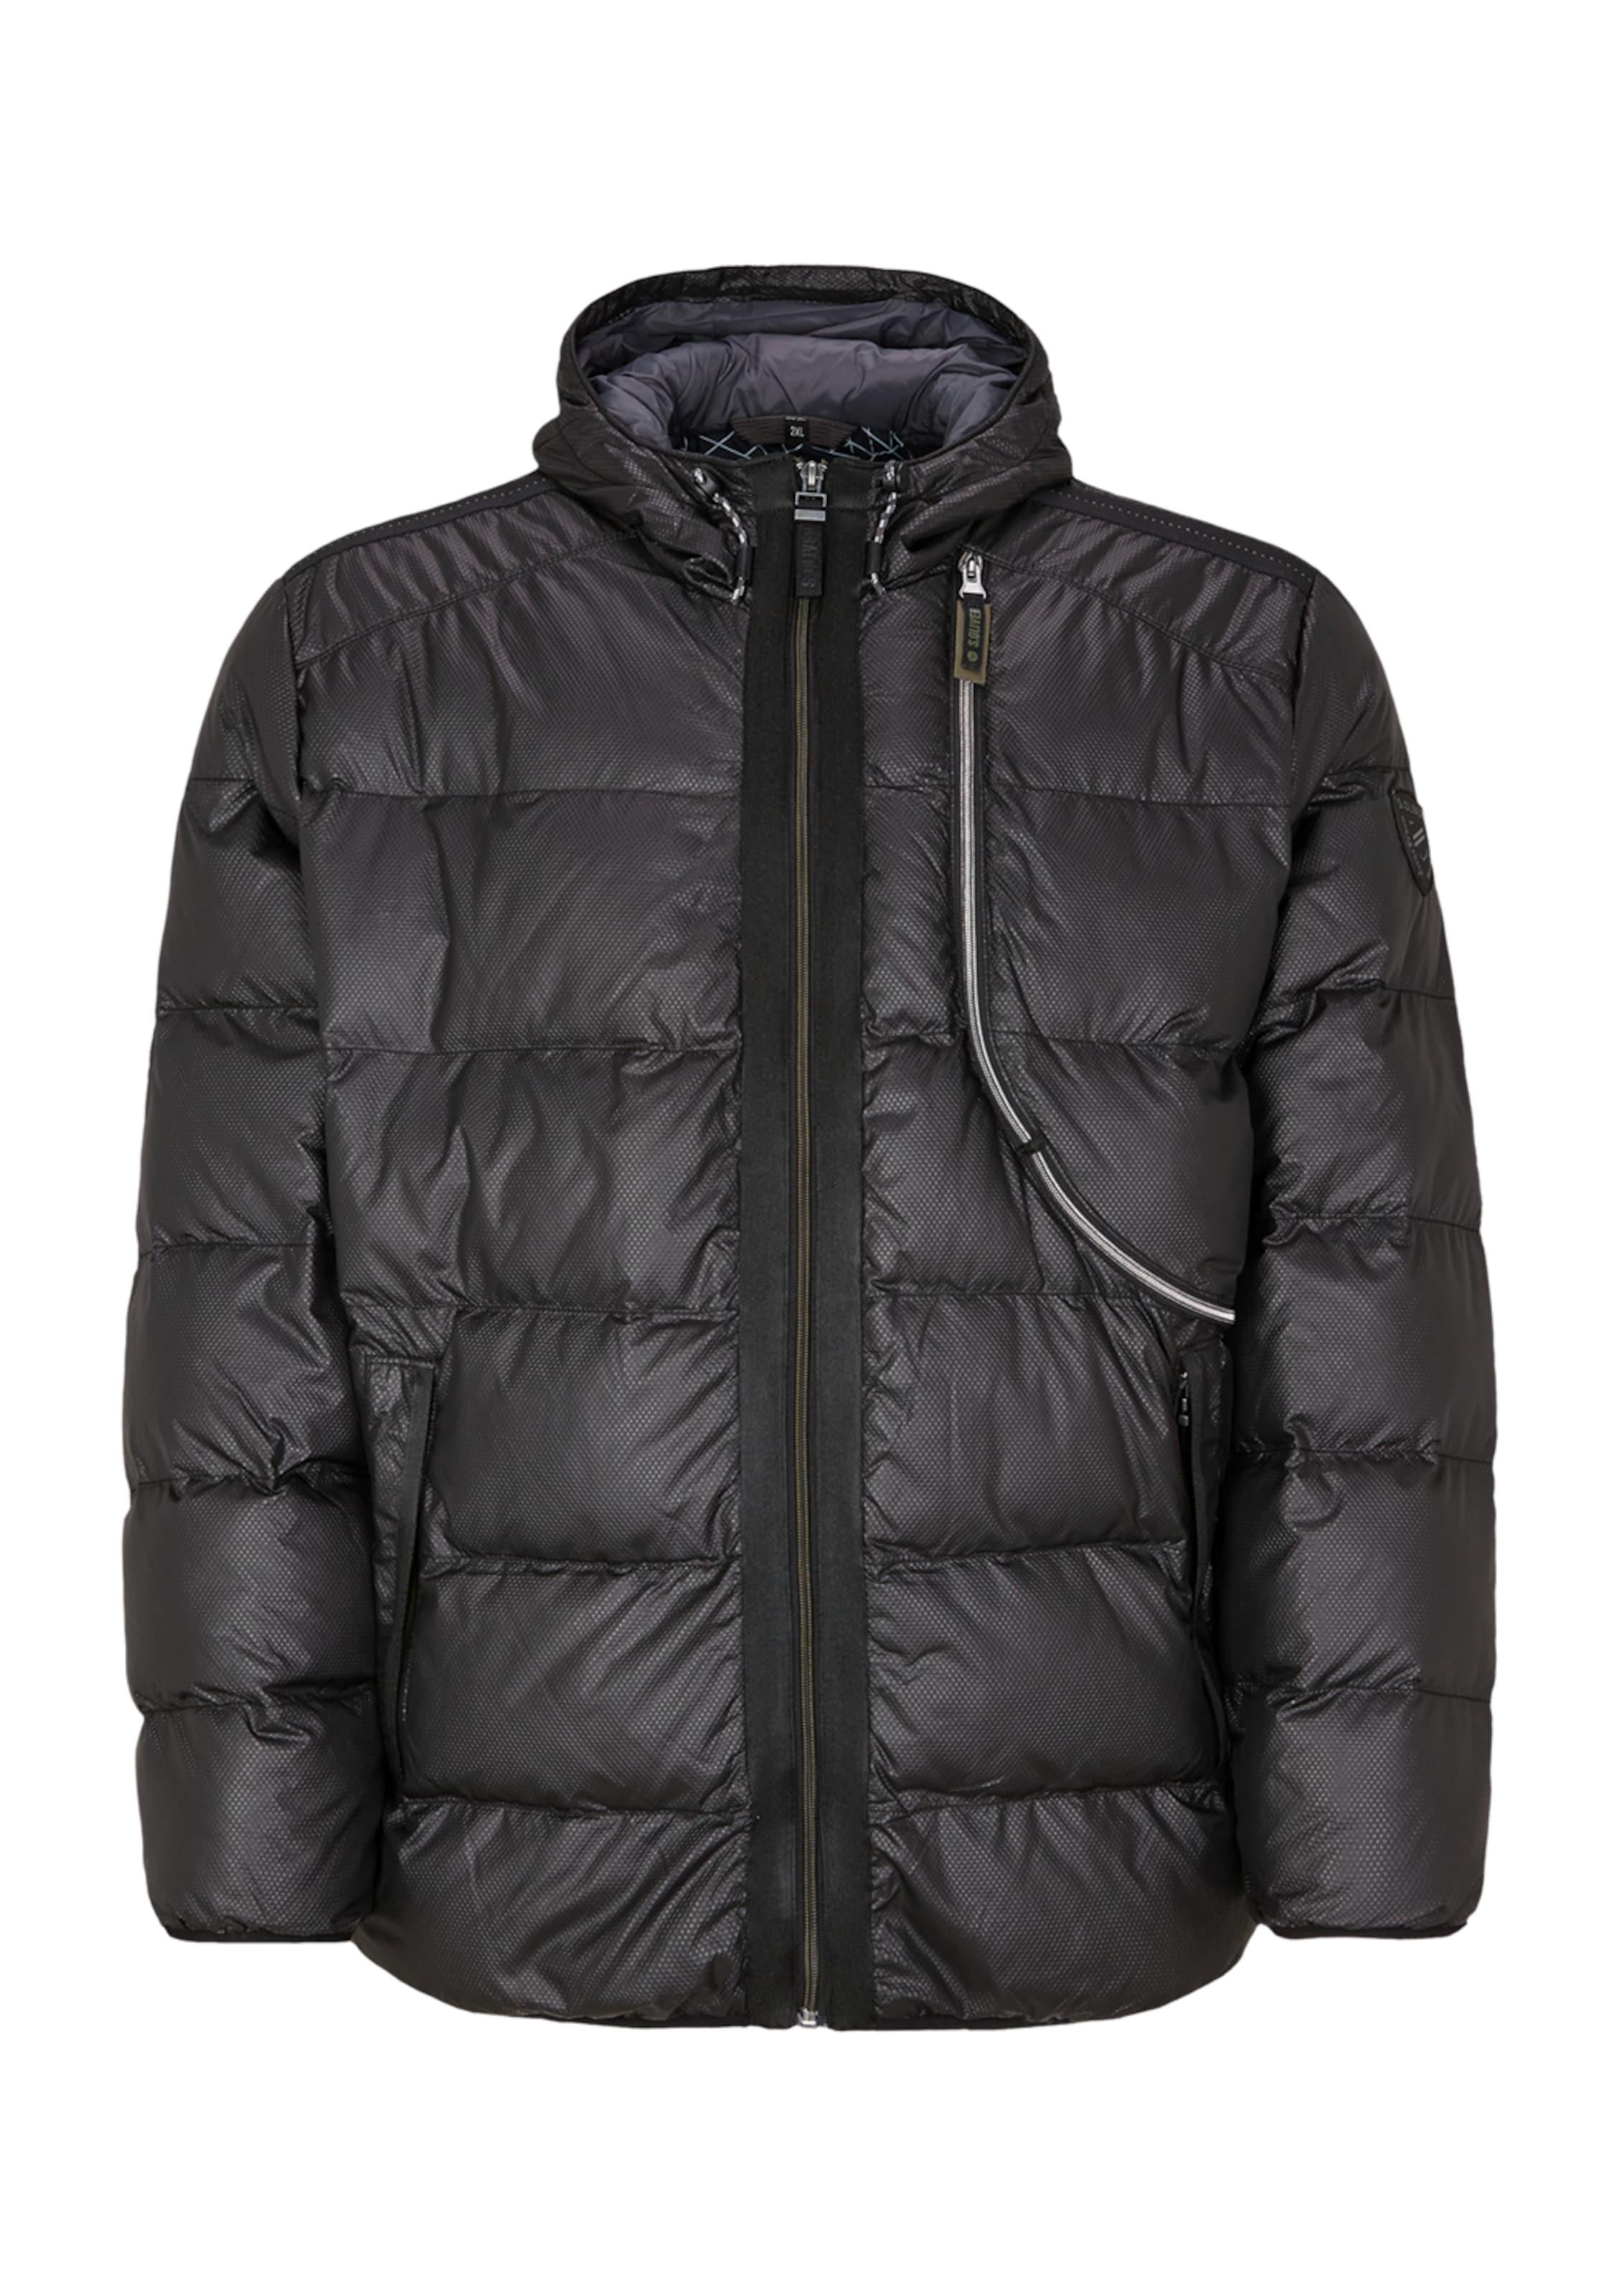 Jacket Schwarz S oliver Red Label In drxQBoCeWE